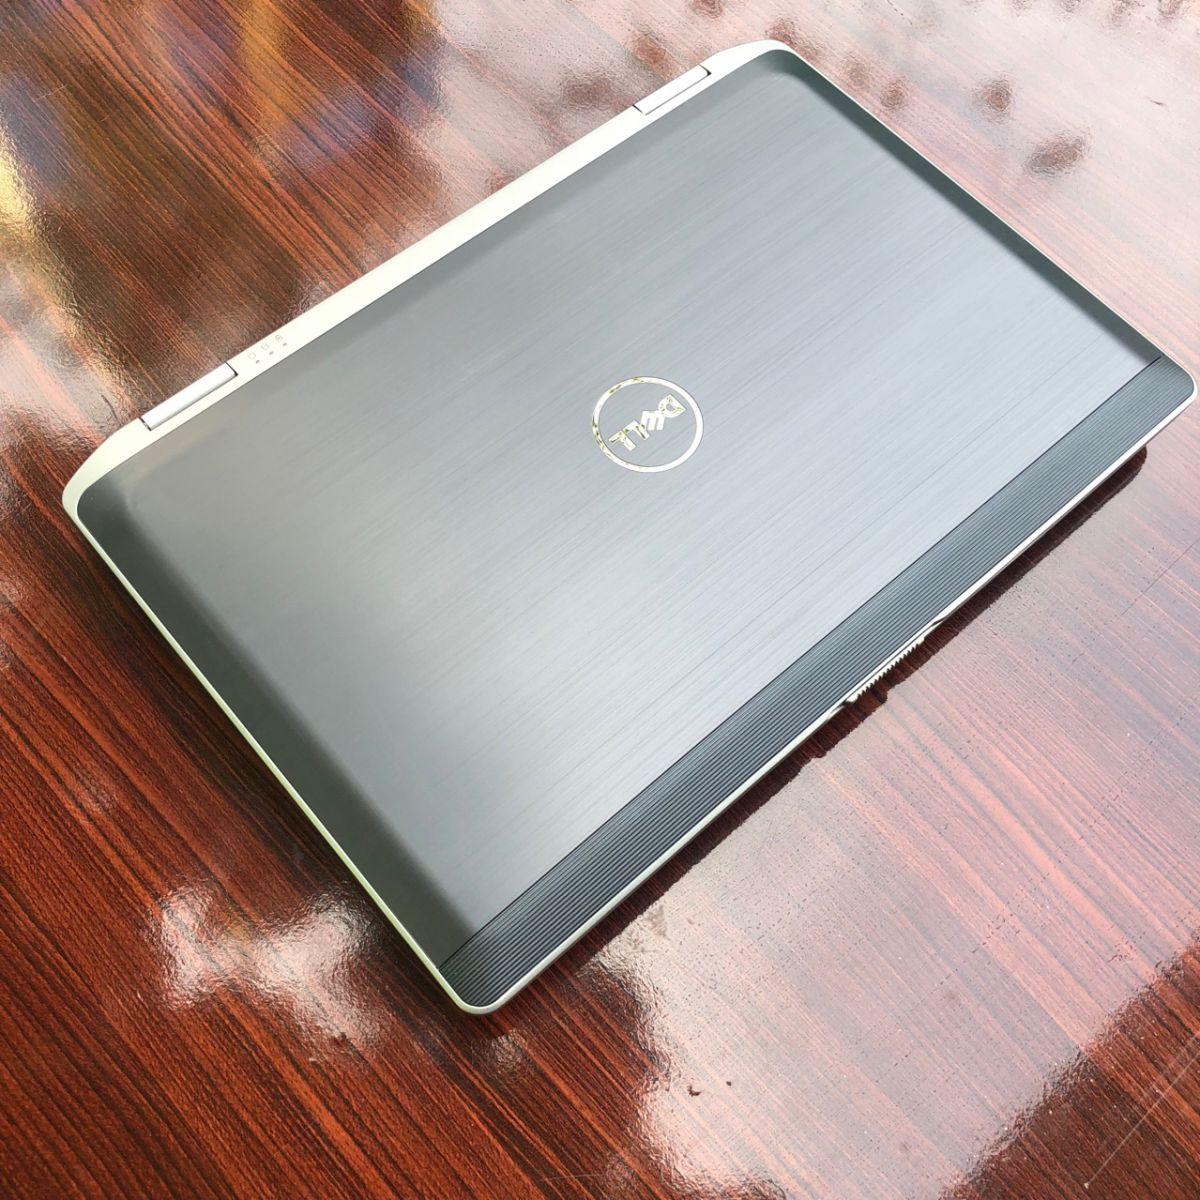 DELL Latitude E6530 (Core i5-3320M, Ram 4GB, SSD 128GB, Màn Hình 15.6 inch)